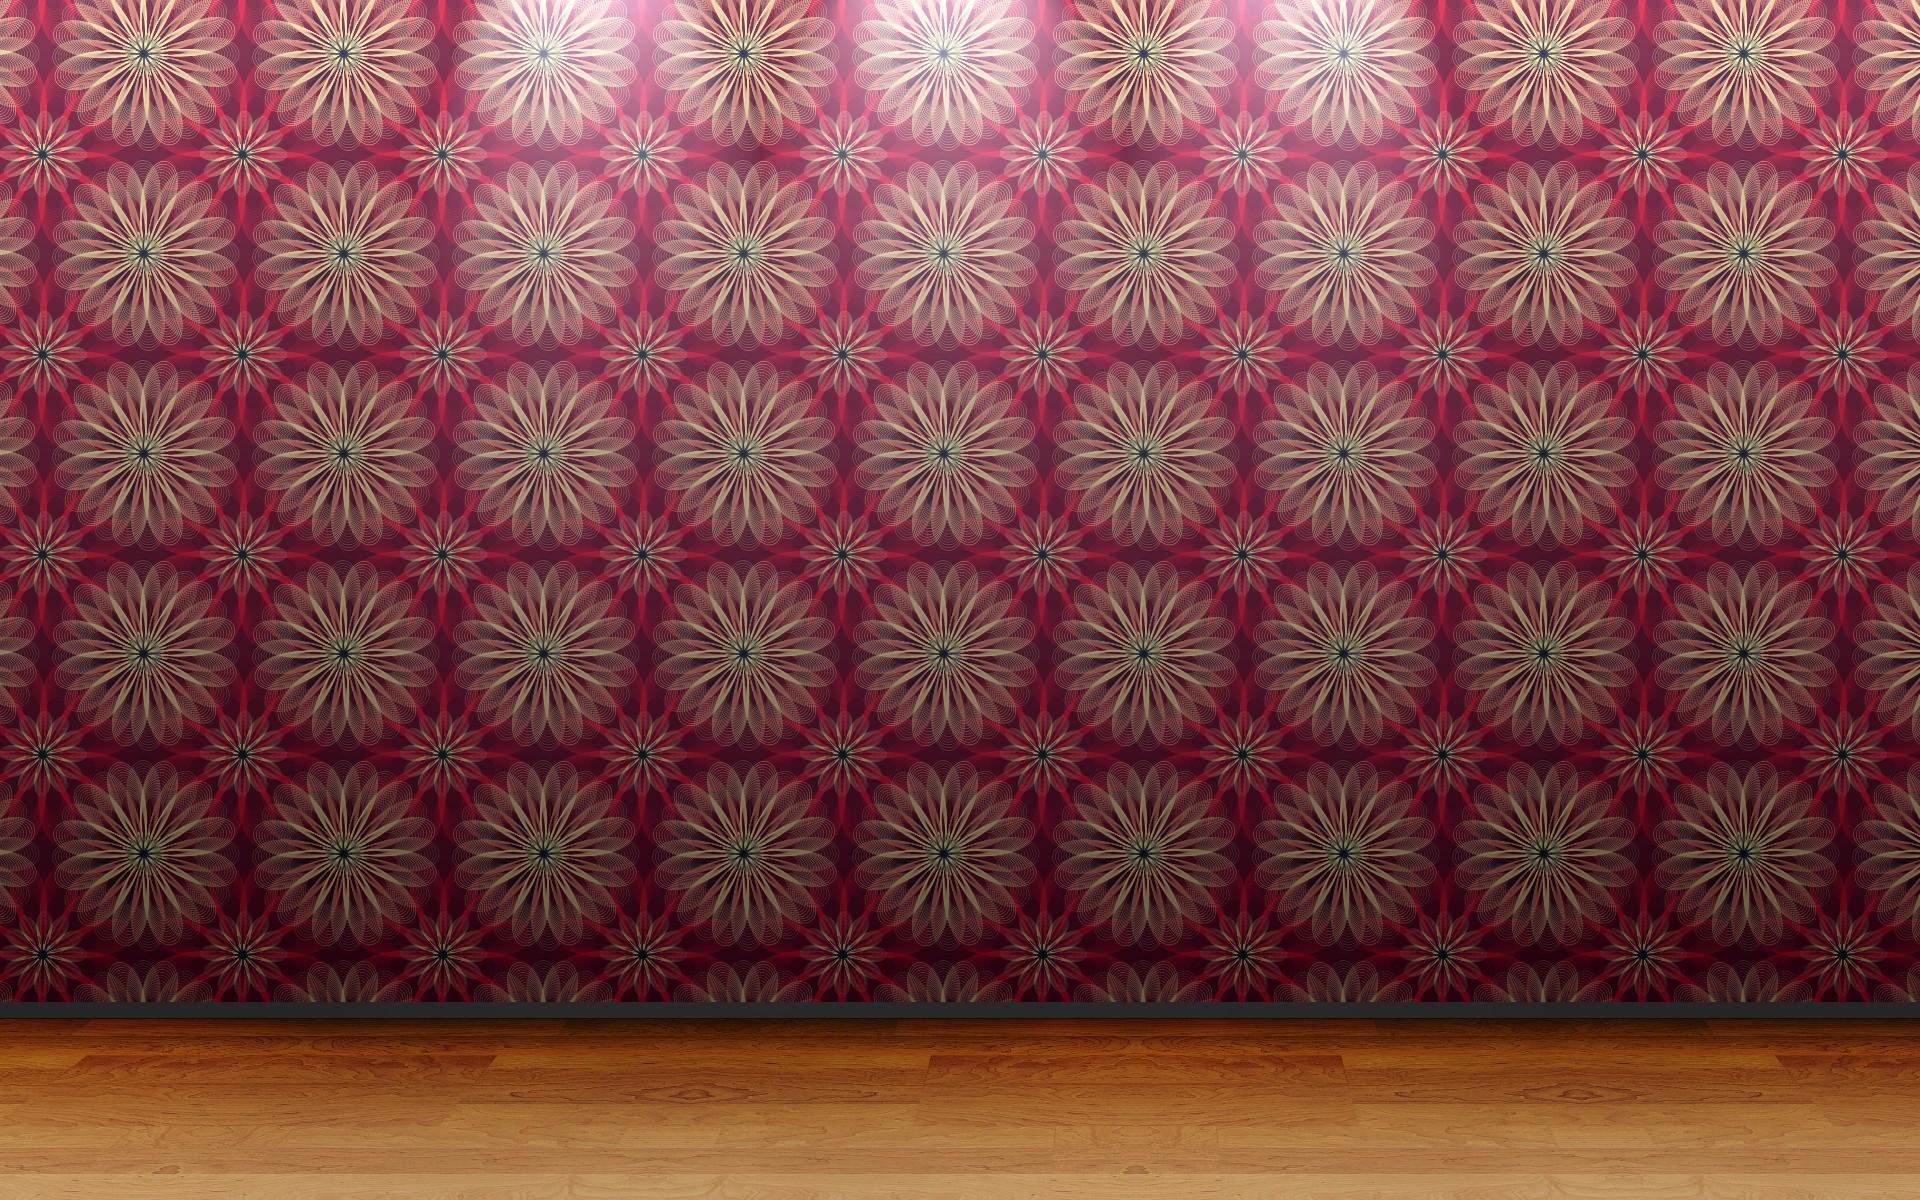 Floor 3D View Wall Room Patterns Wallpaper 1920x1200